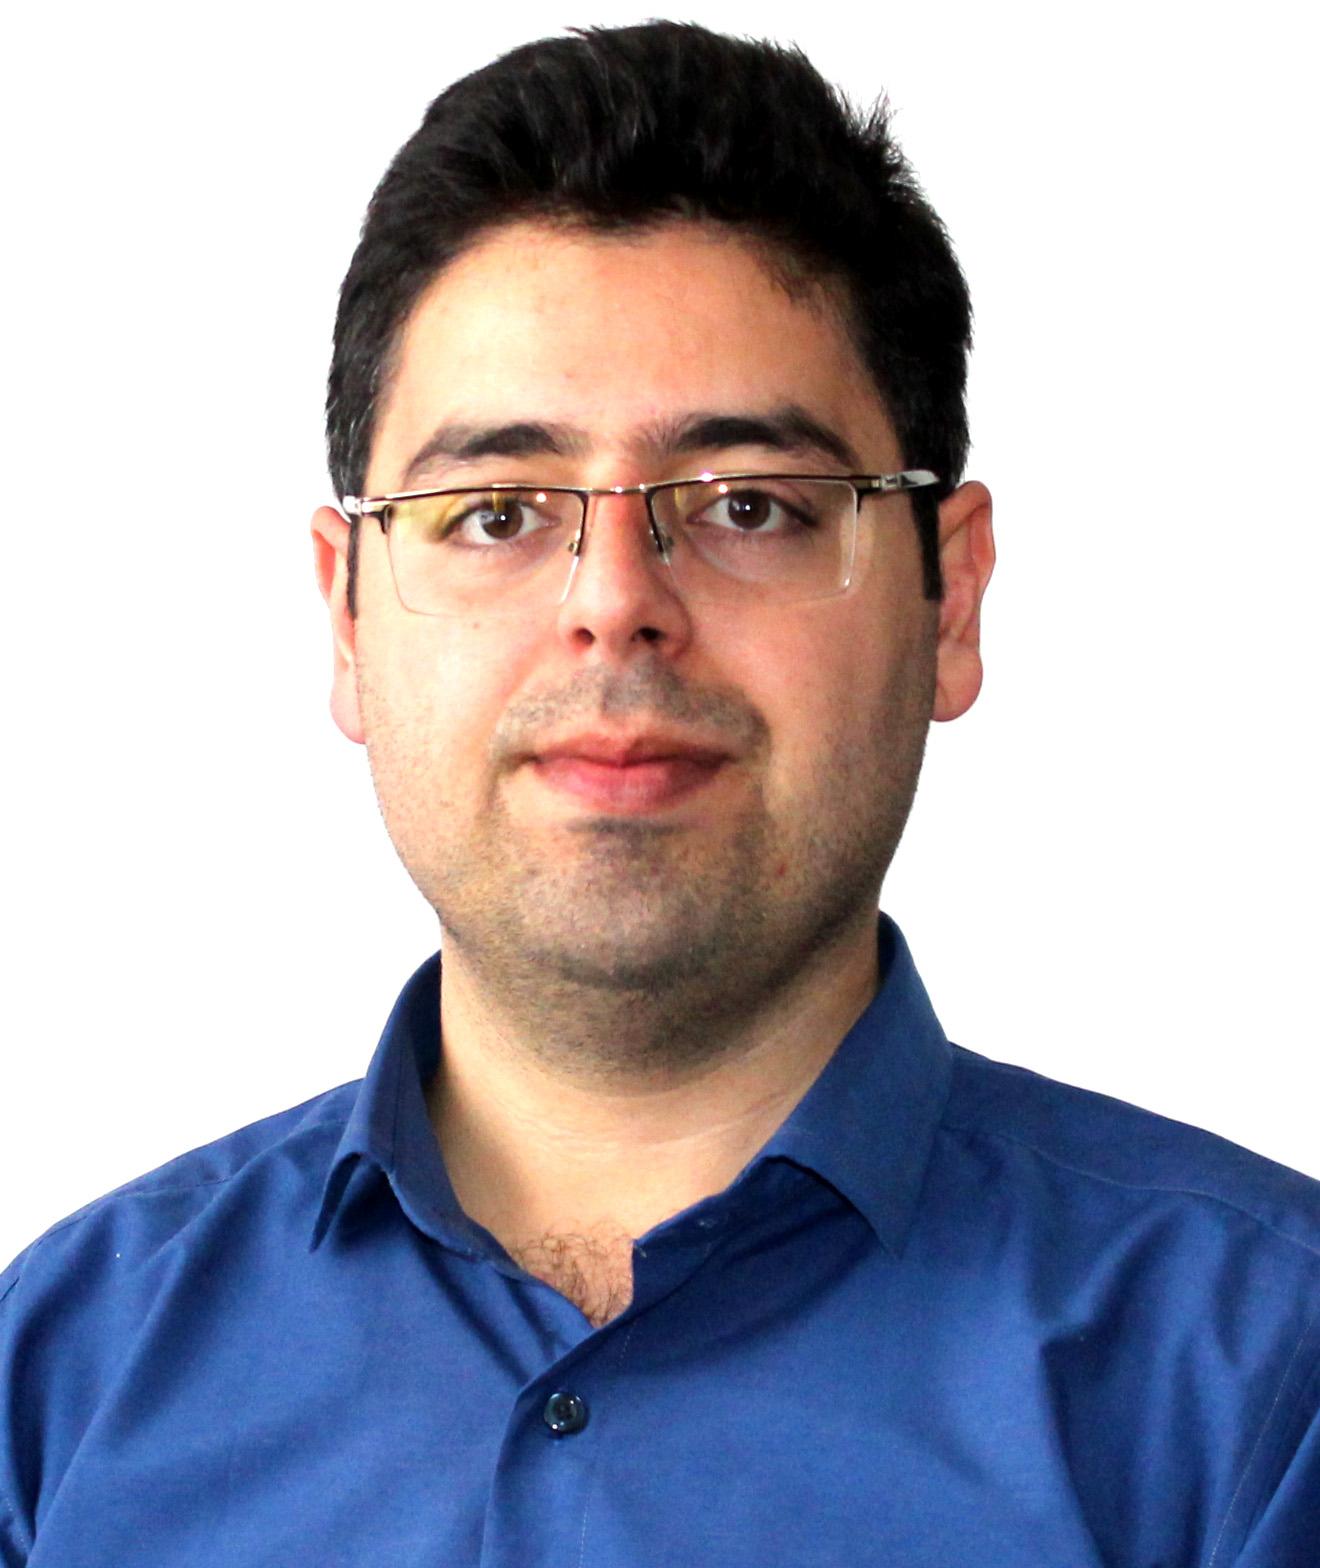 Dr. Saeed Hosseinian